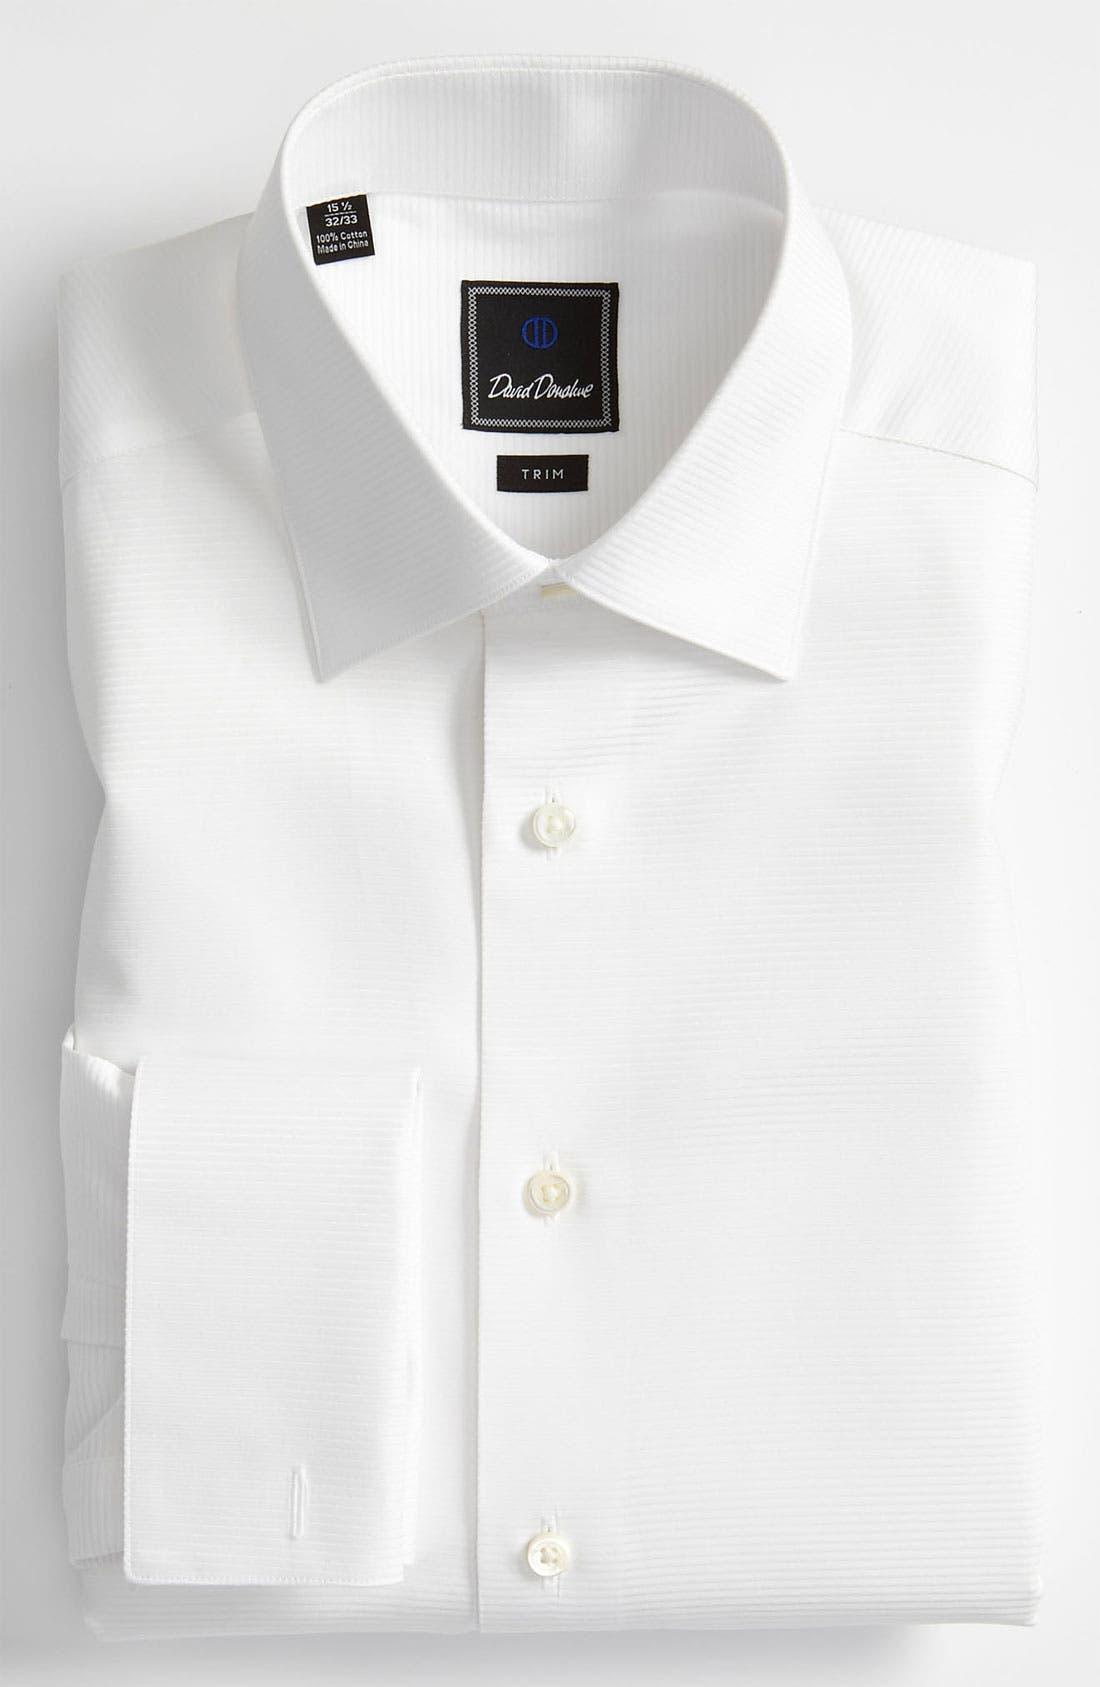 Main Image - David Donahue Trim Fit Twill French Cuff Tuxedo Shirt